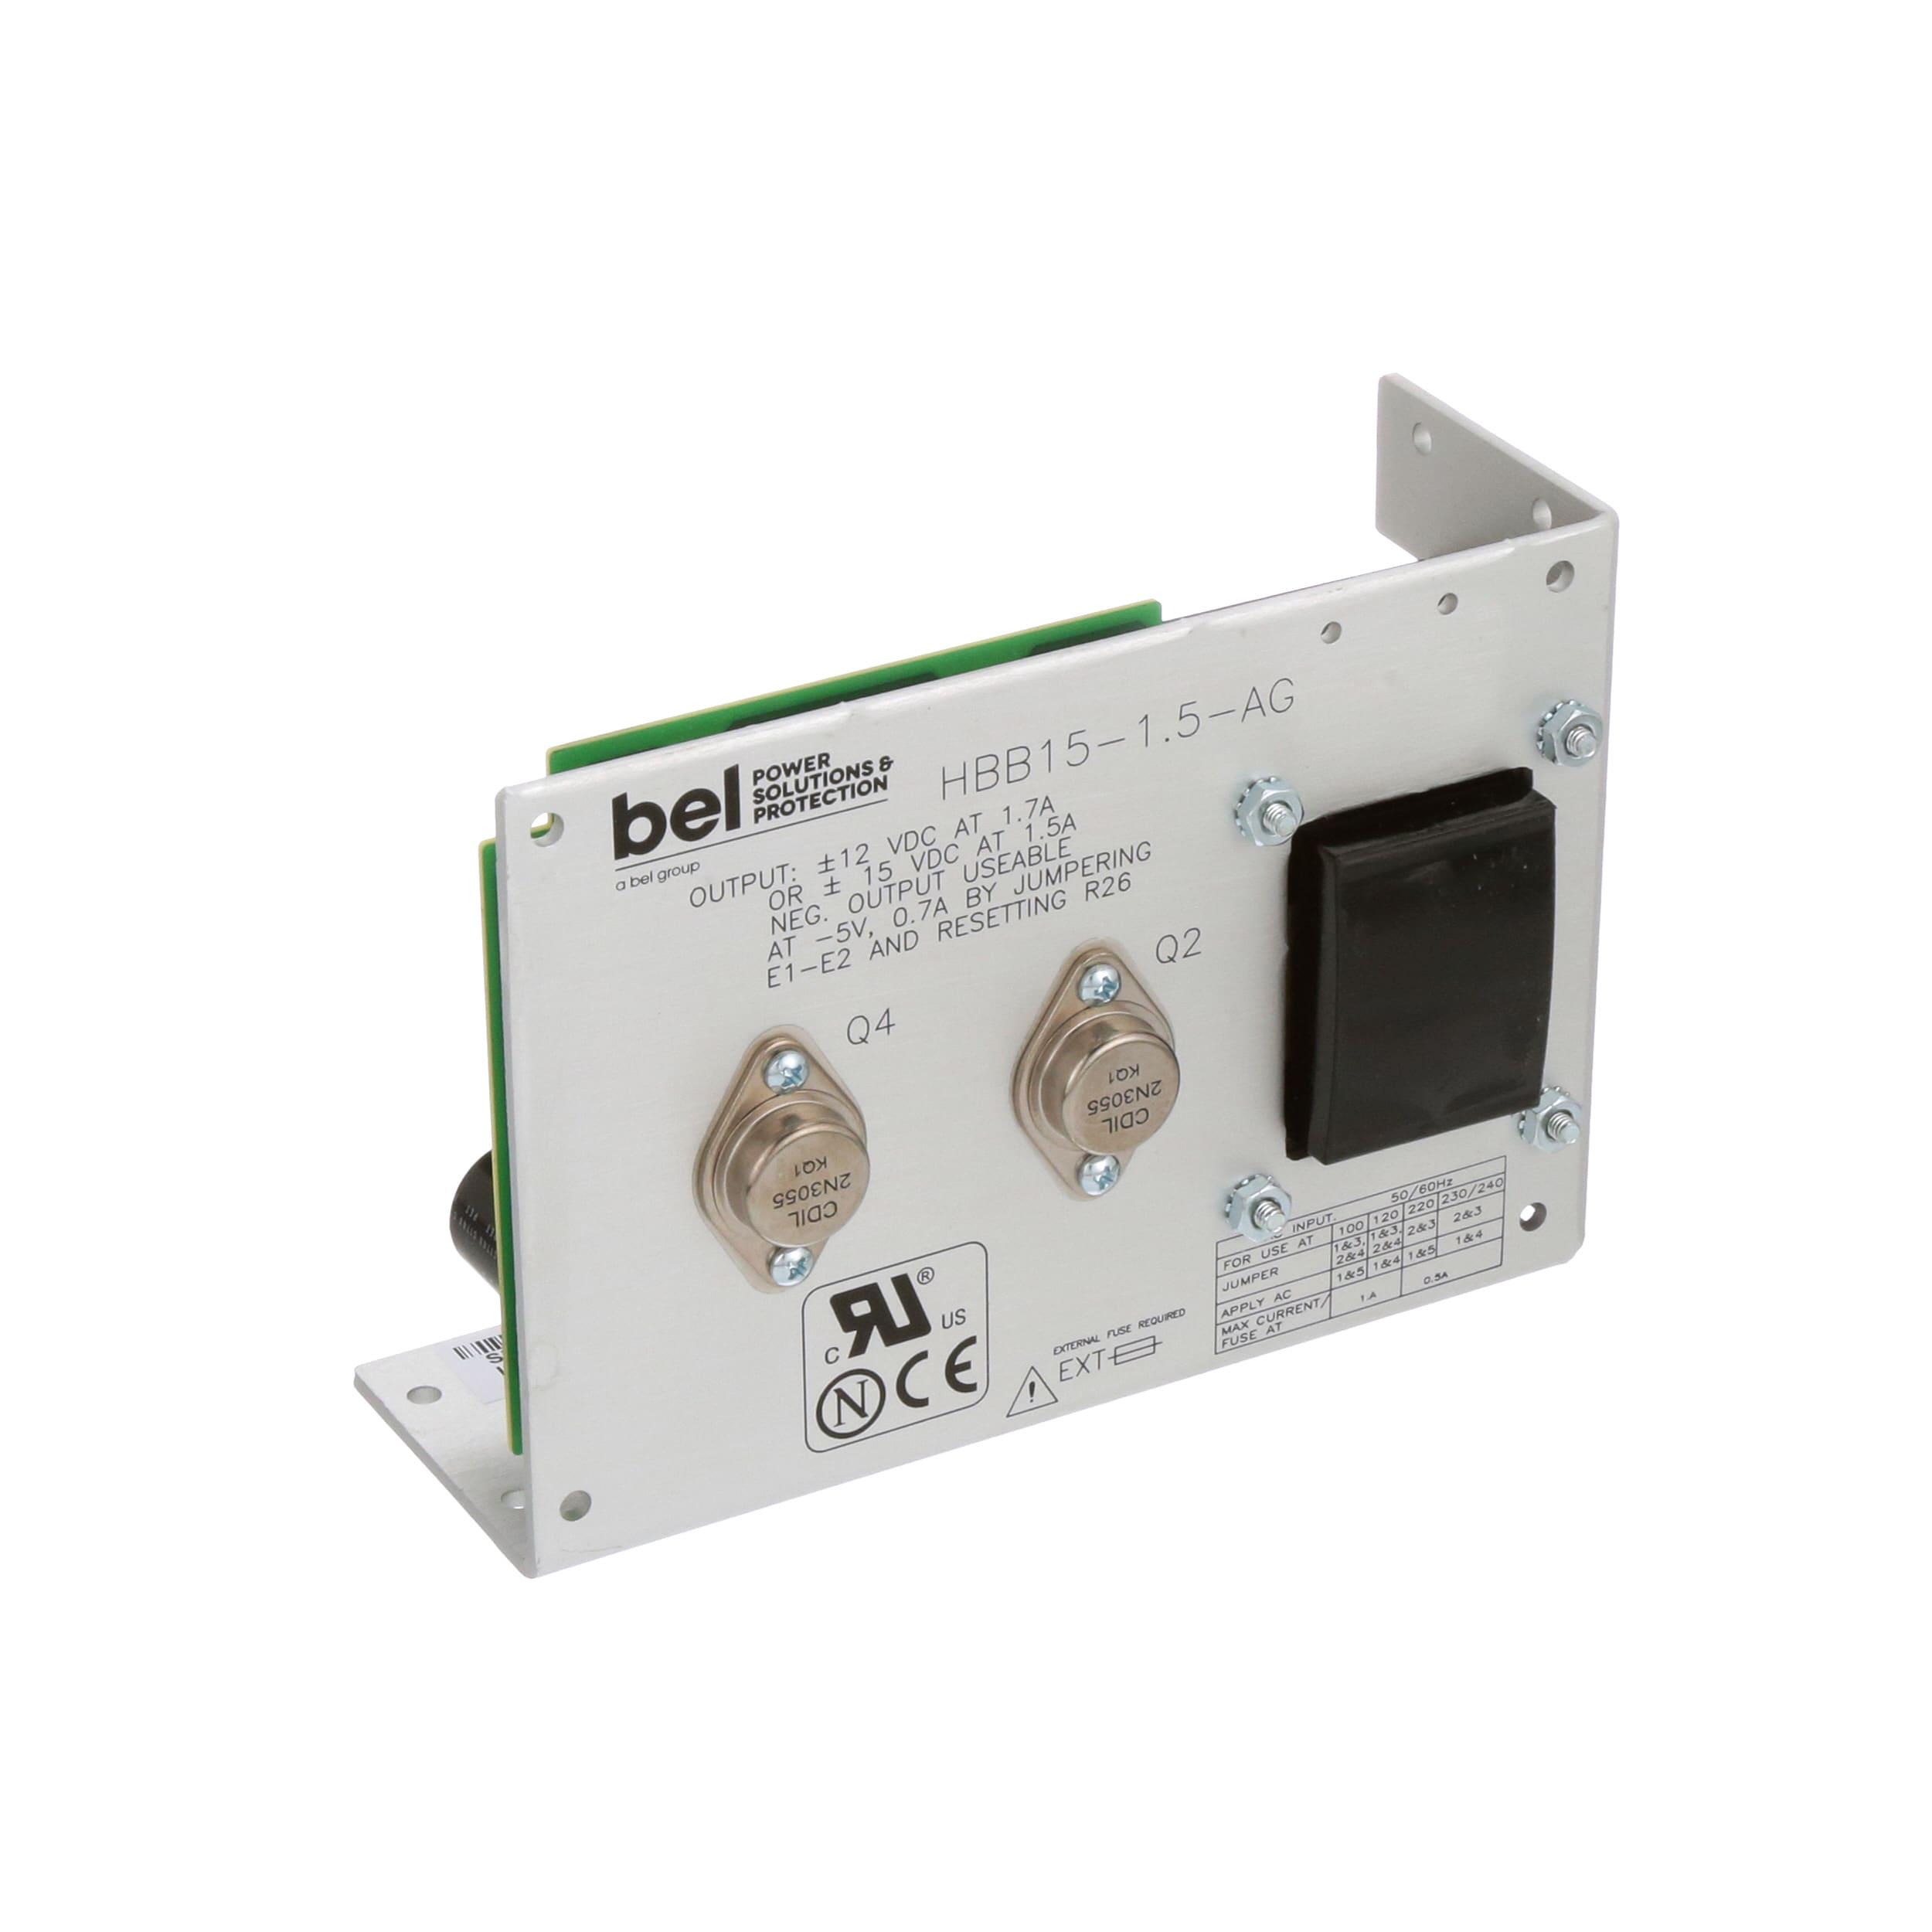 15V@1.5A; 100-264V in; Open Frame; Panel Mount; Linear Power Supply; AC-DC; 15V@1.5A Bel Power Solutions HBB15-1.5-AG